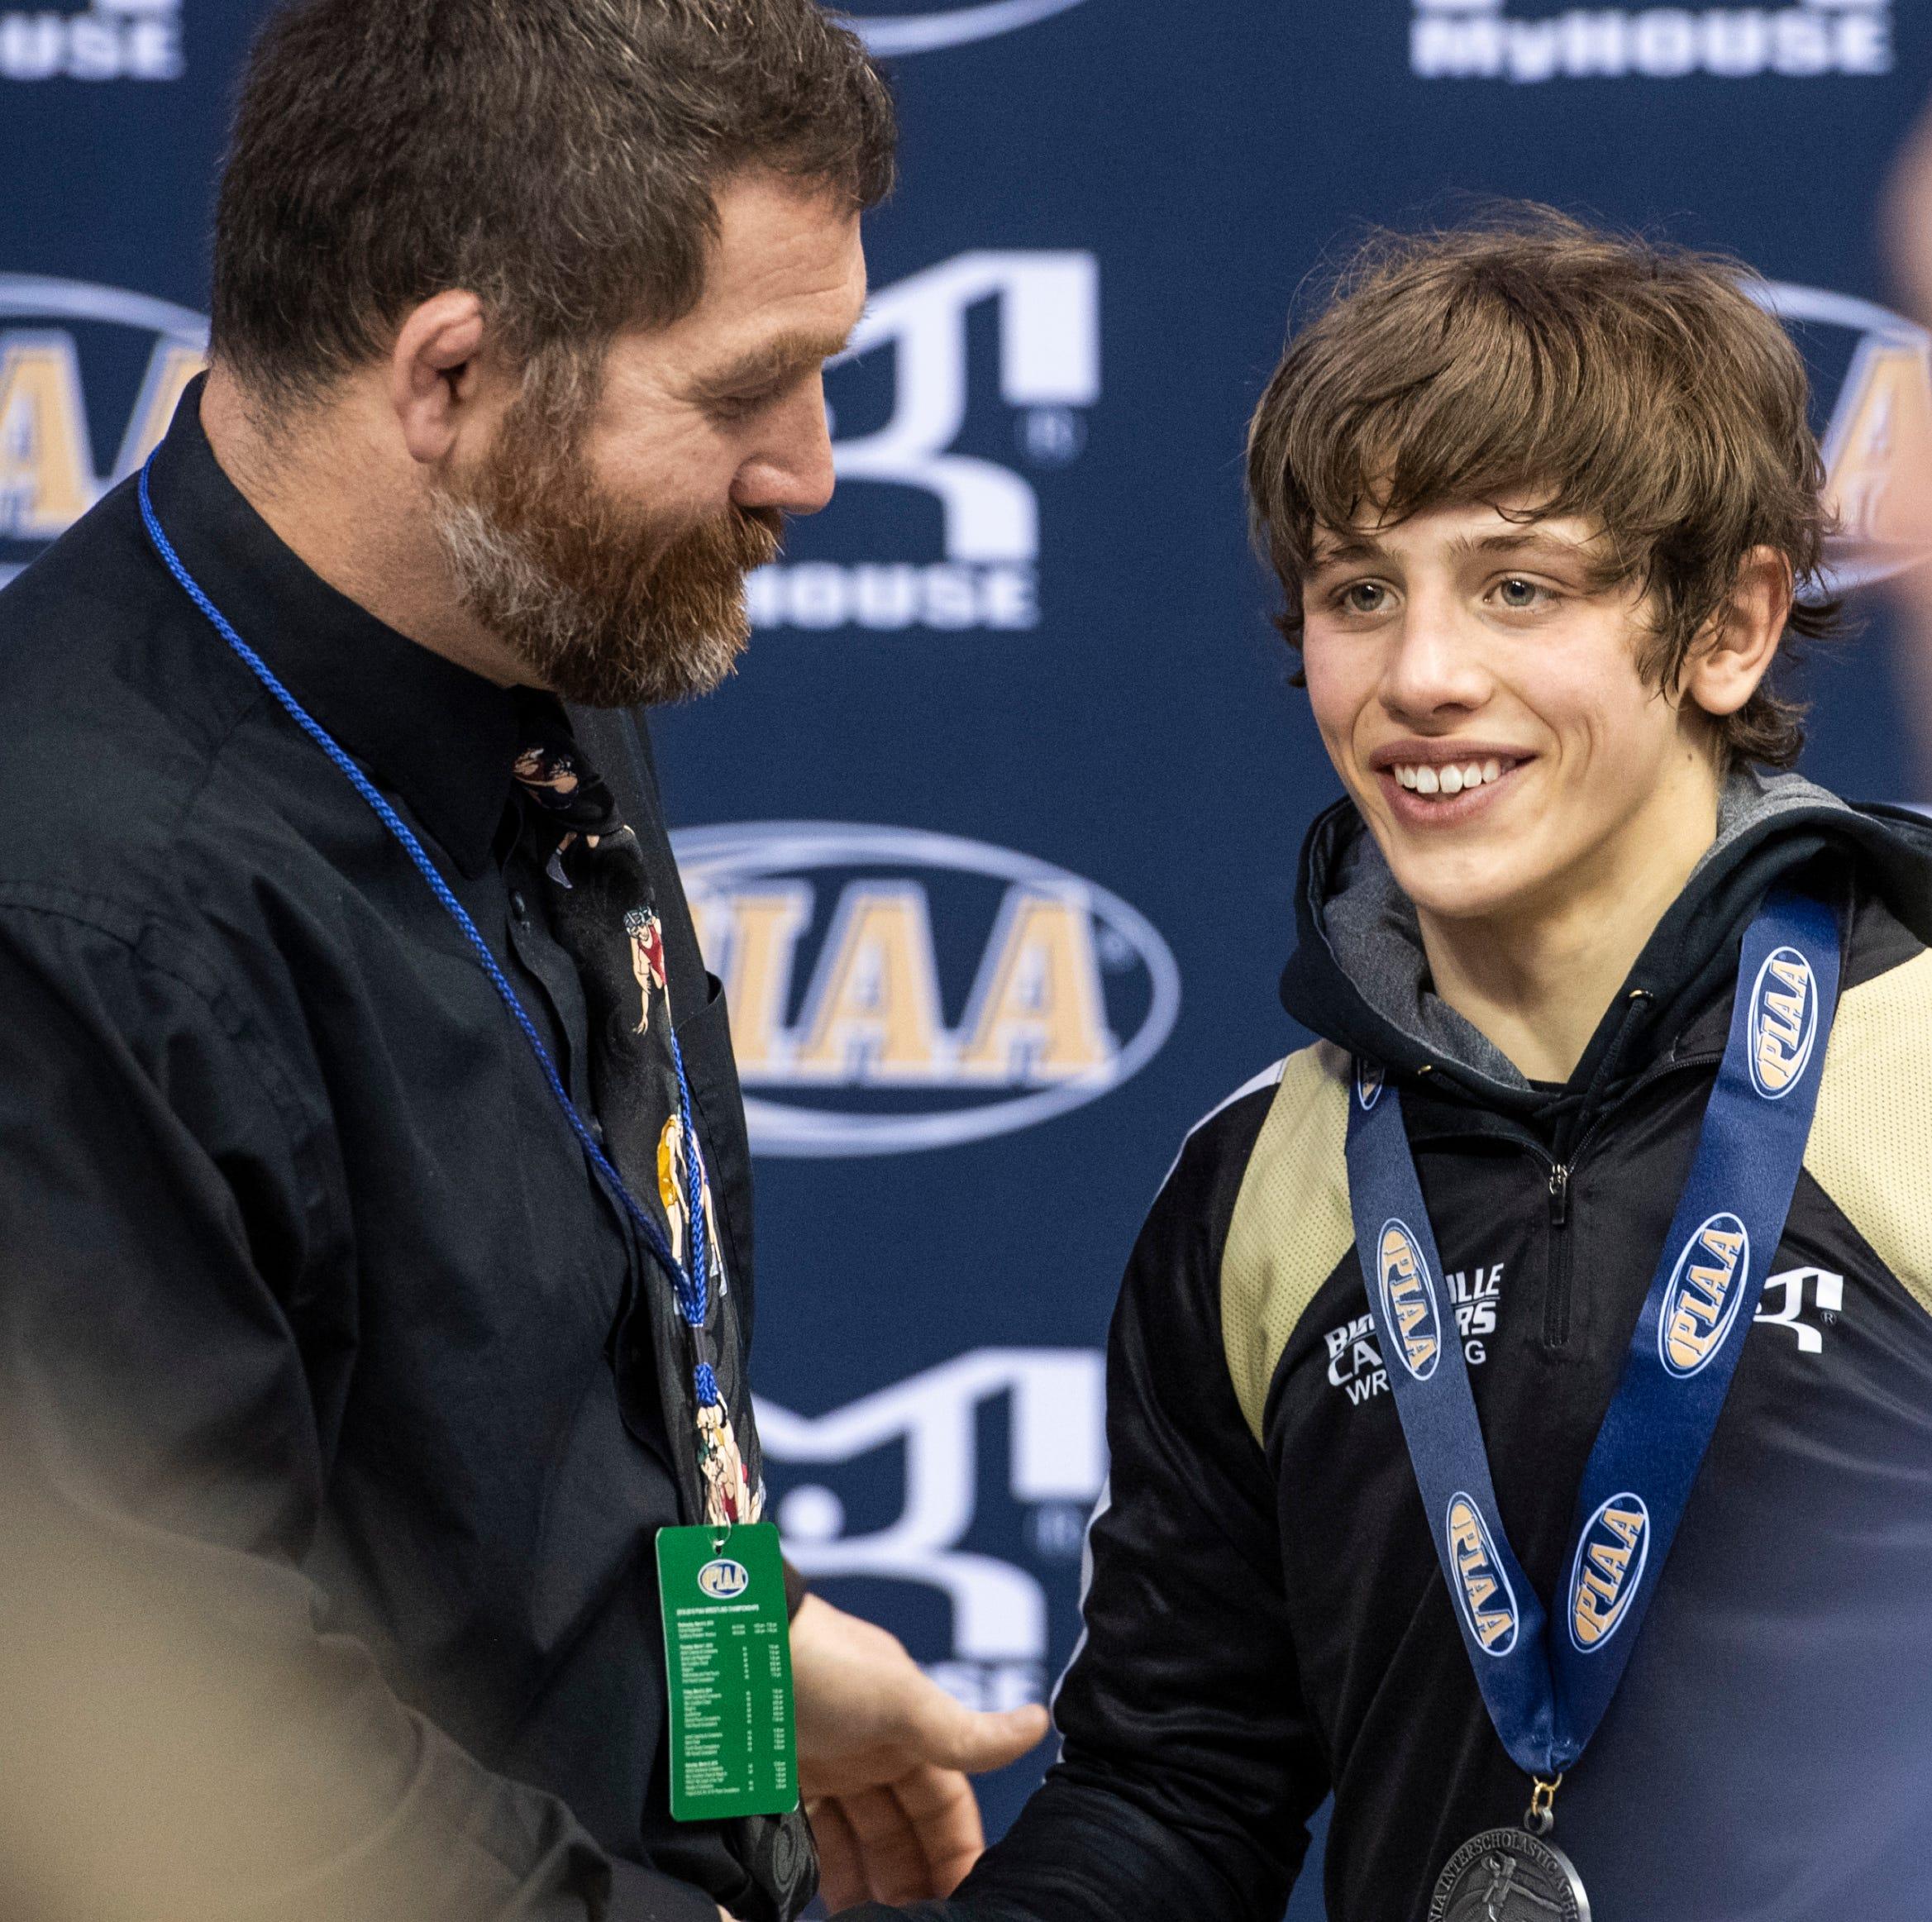 PIAA wrestling results: Biglerville freshman takes home silver